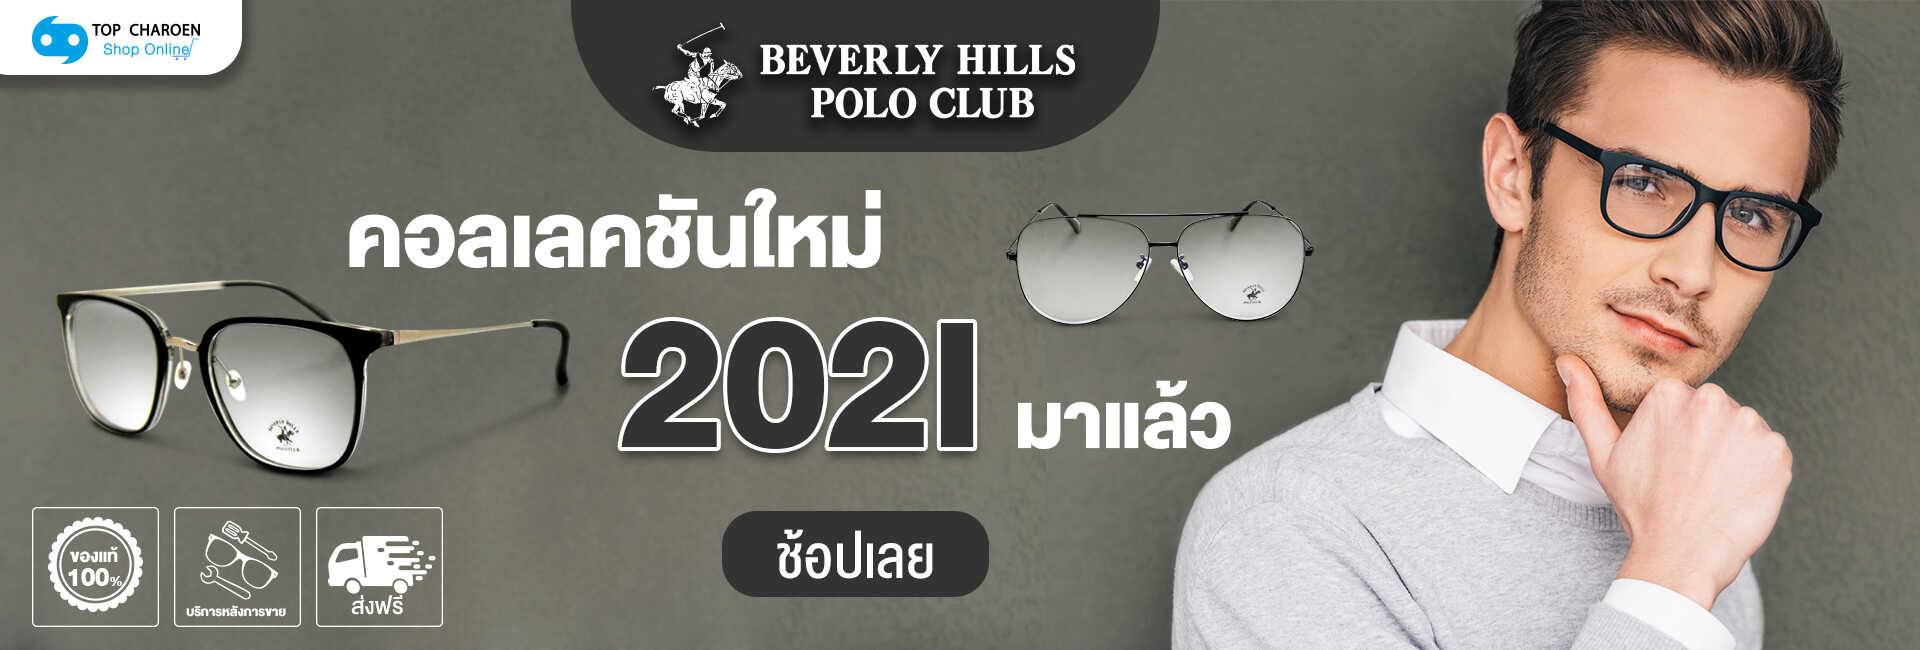 https://shoponline.topcharoen.co.th/brands/beverly-hills-polo-club.html